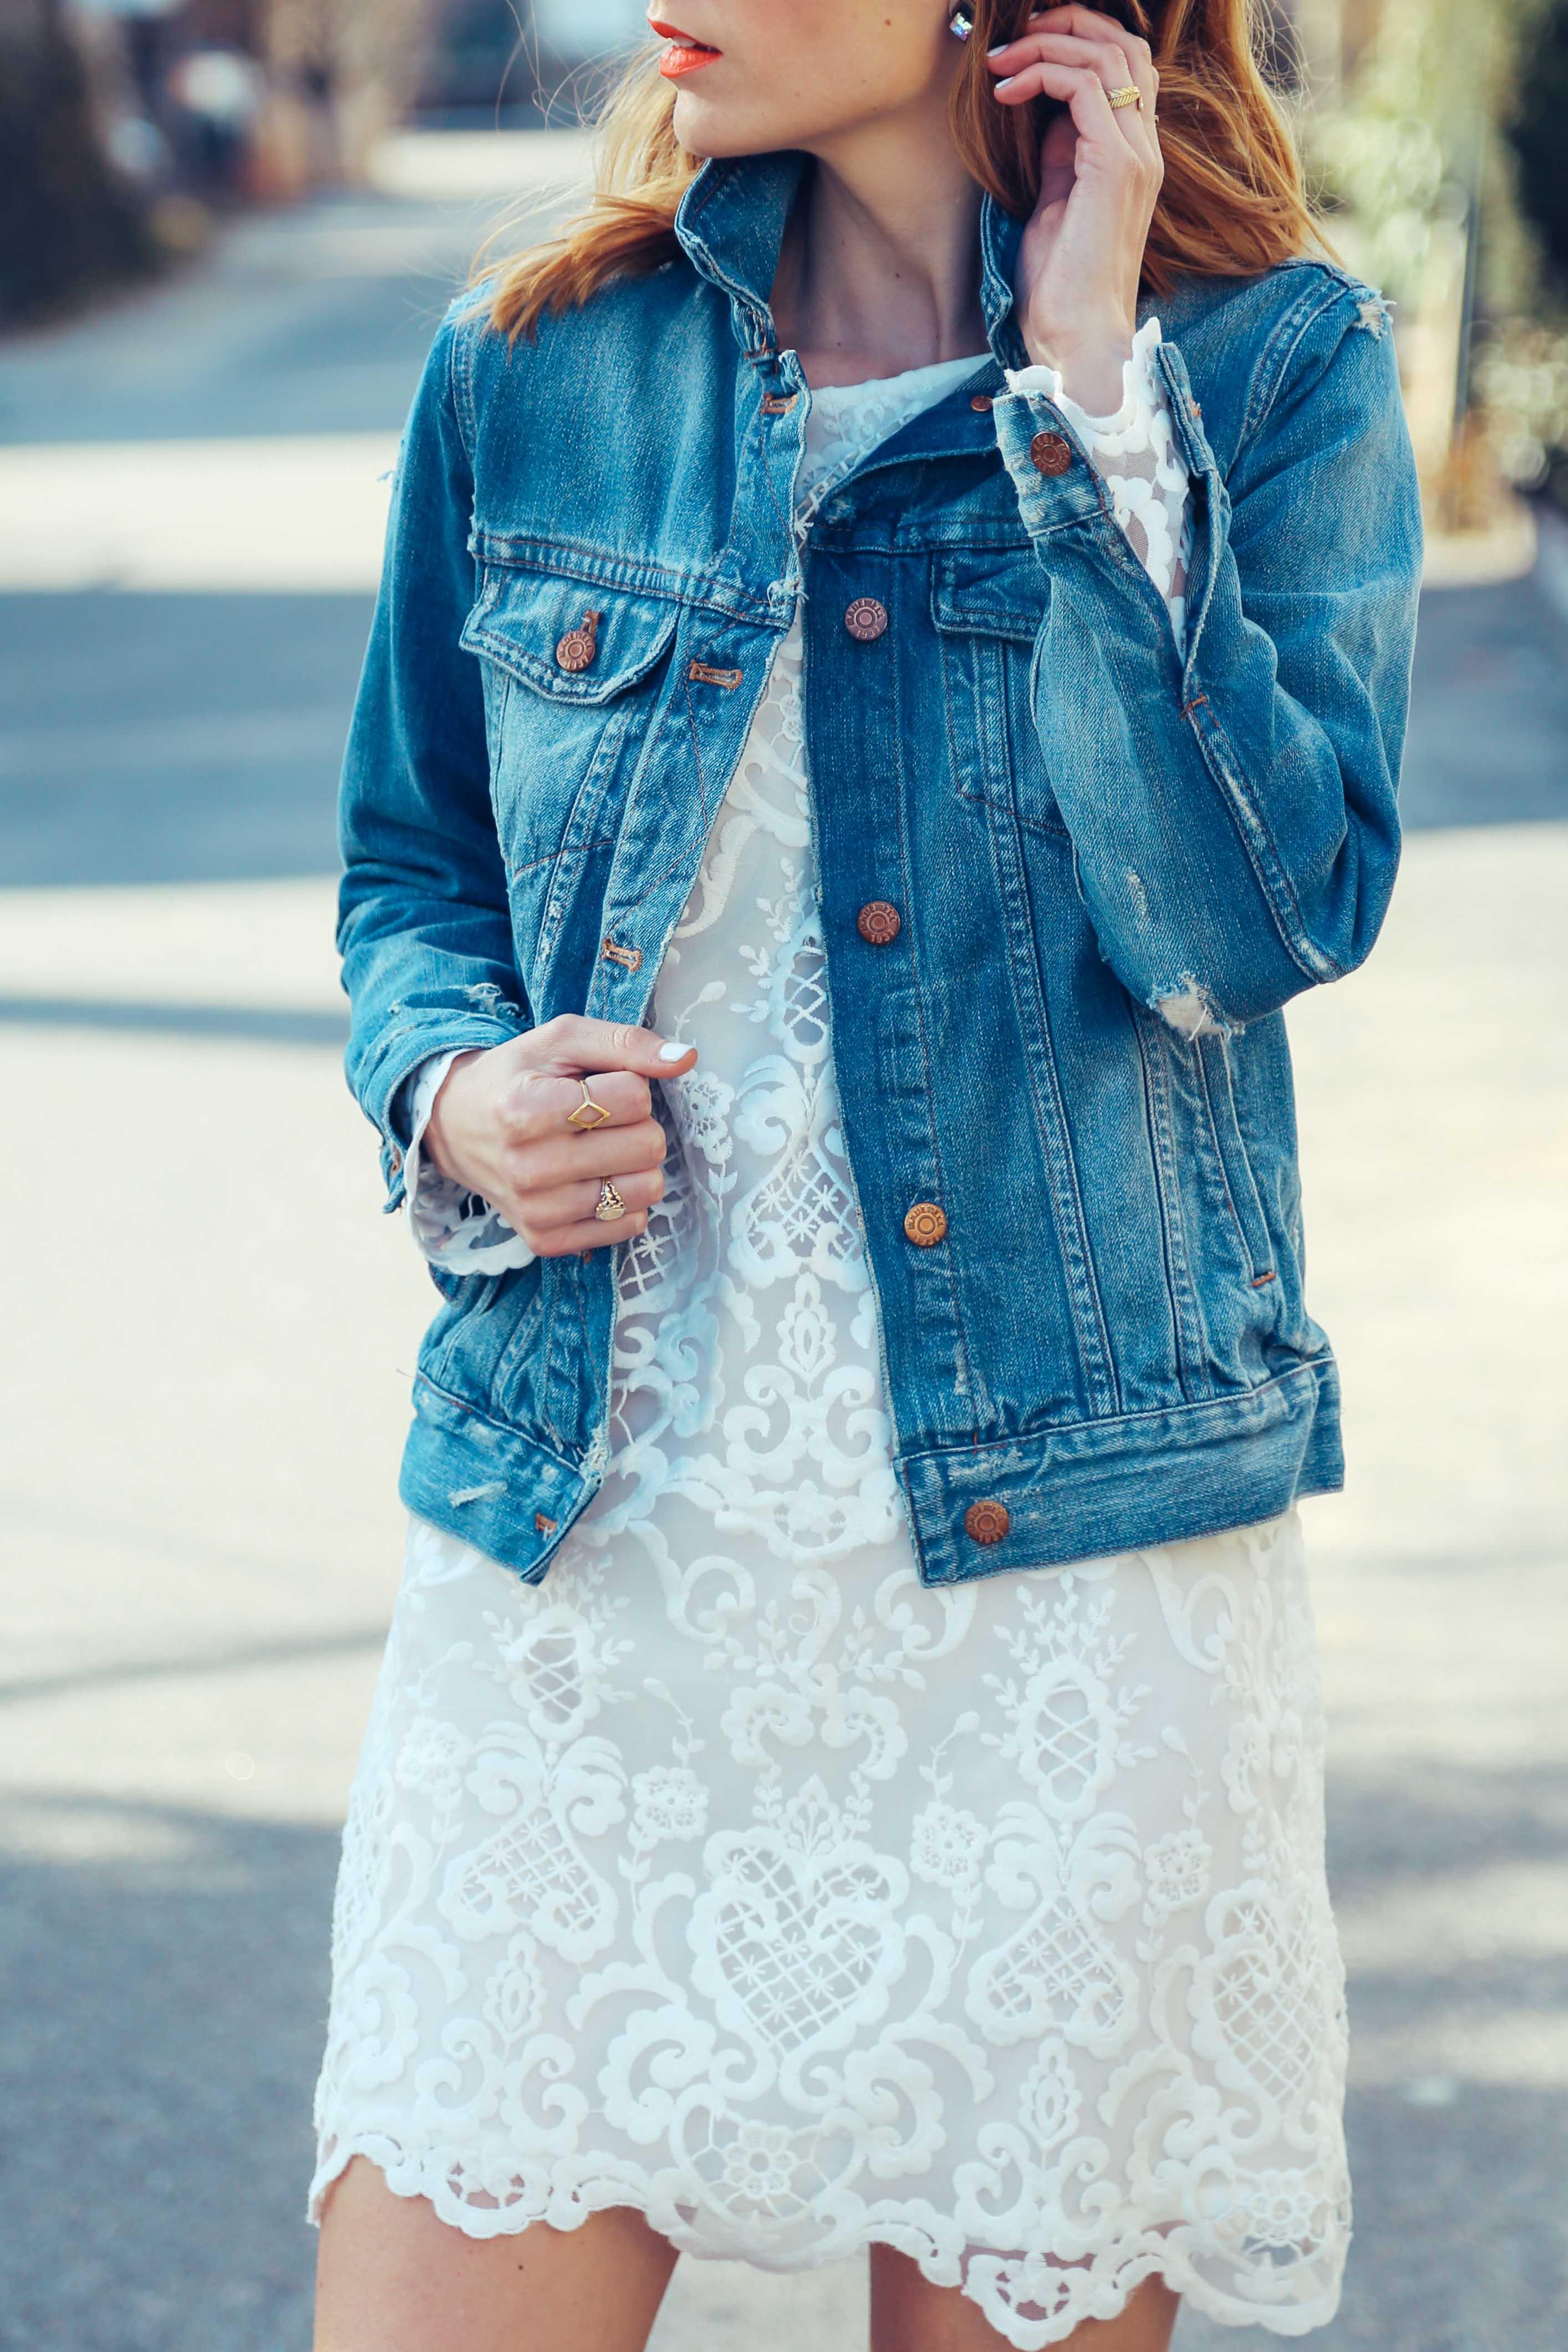 Denim jacket white dress